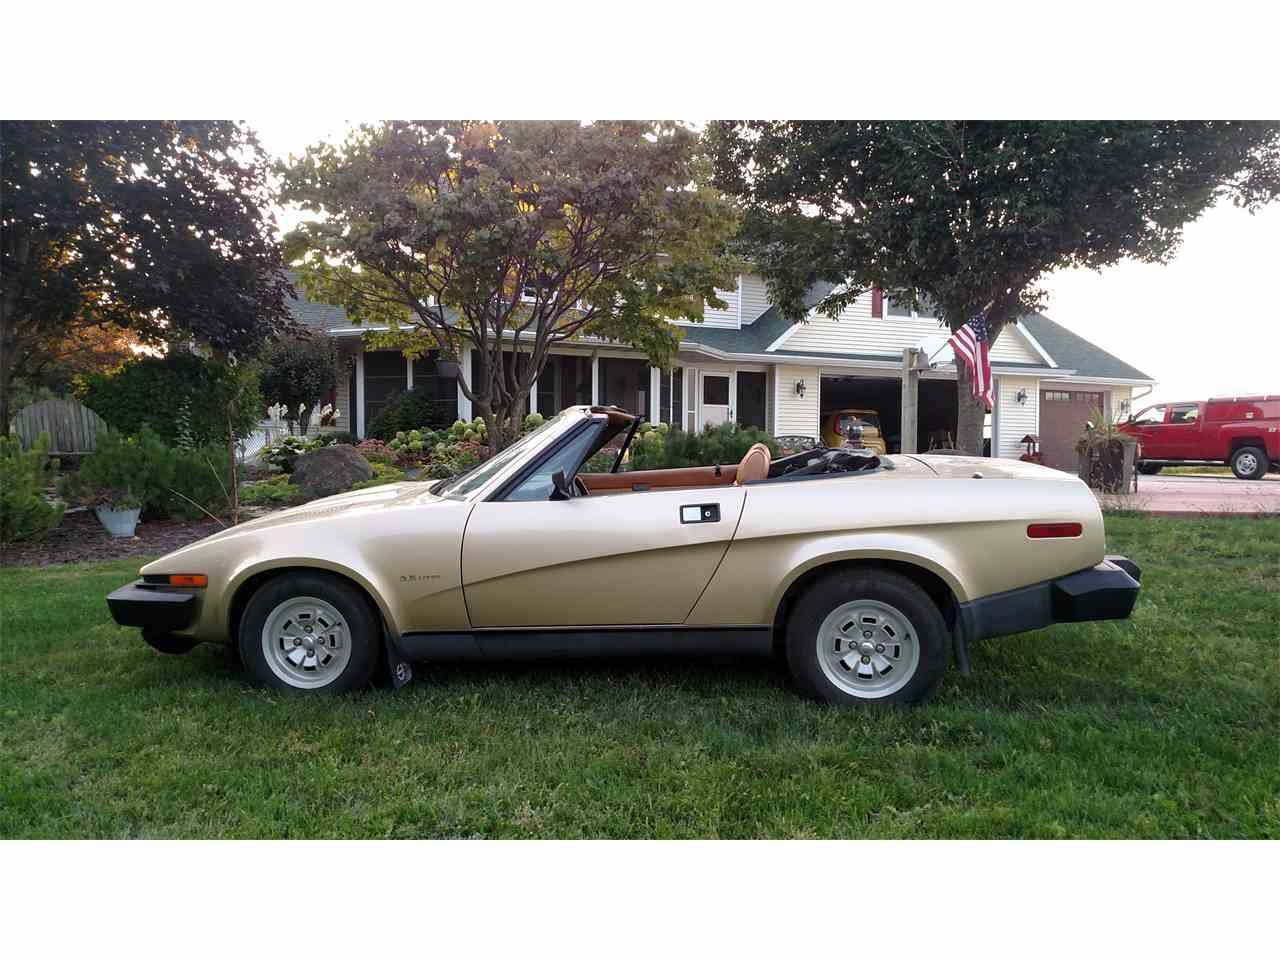 1982 Triumph TR8 for Sale | ClassicCars.com | CC-1057883